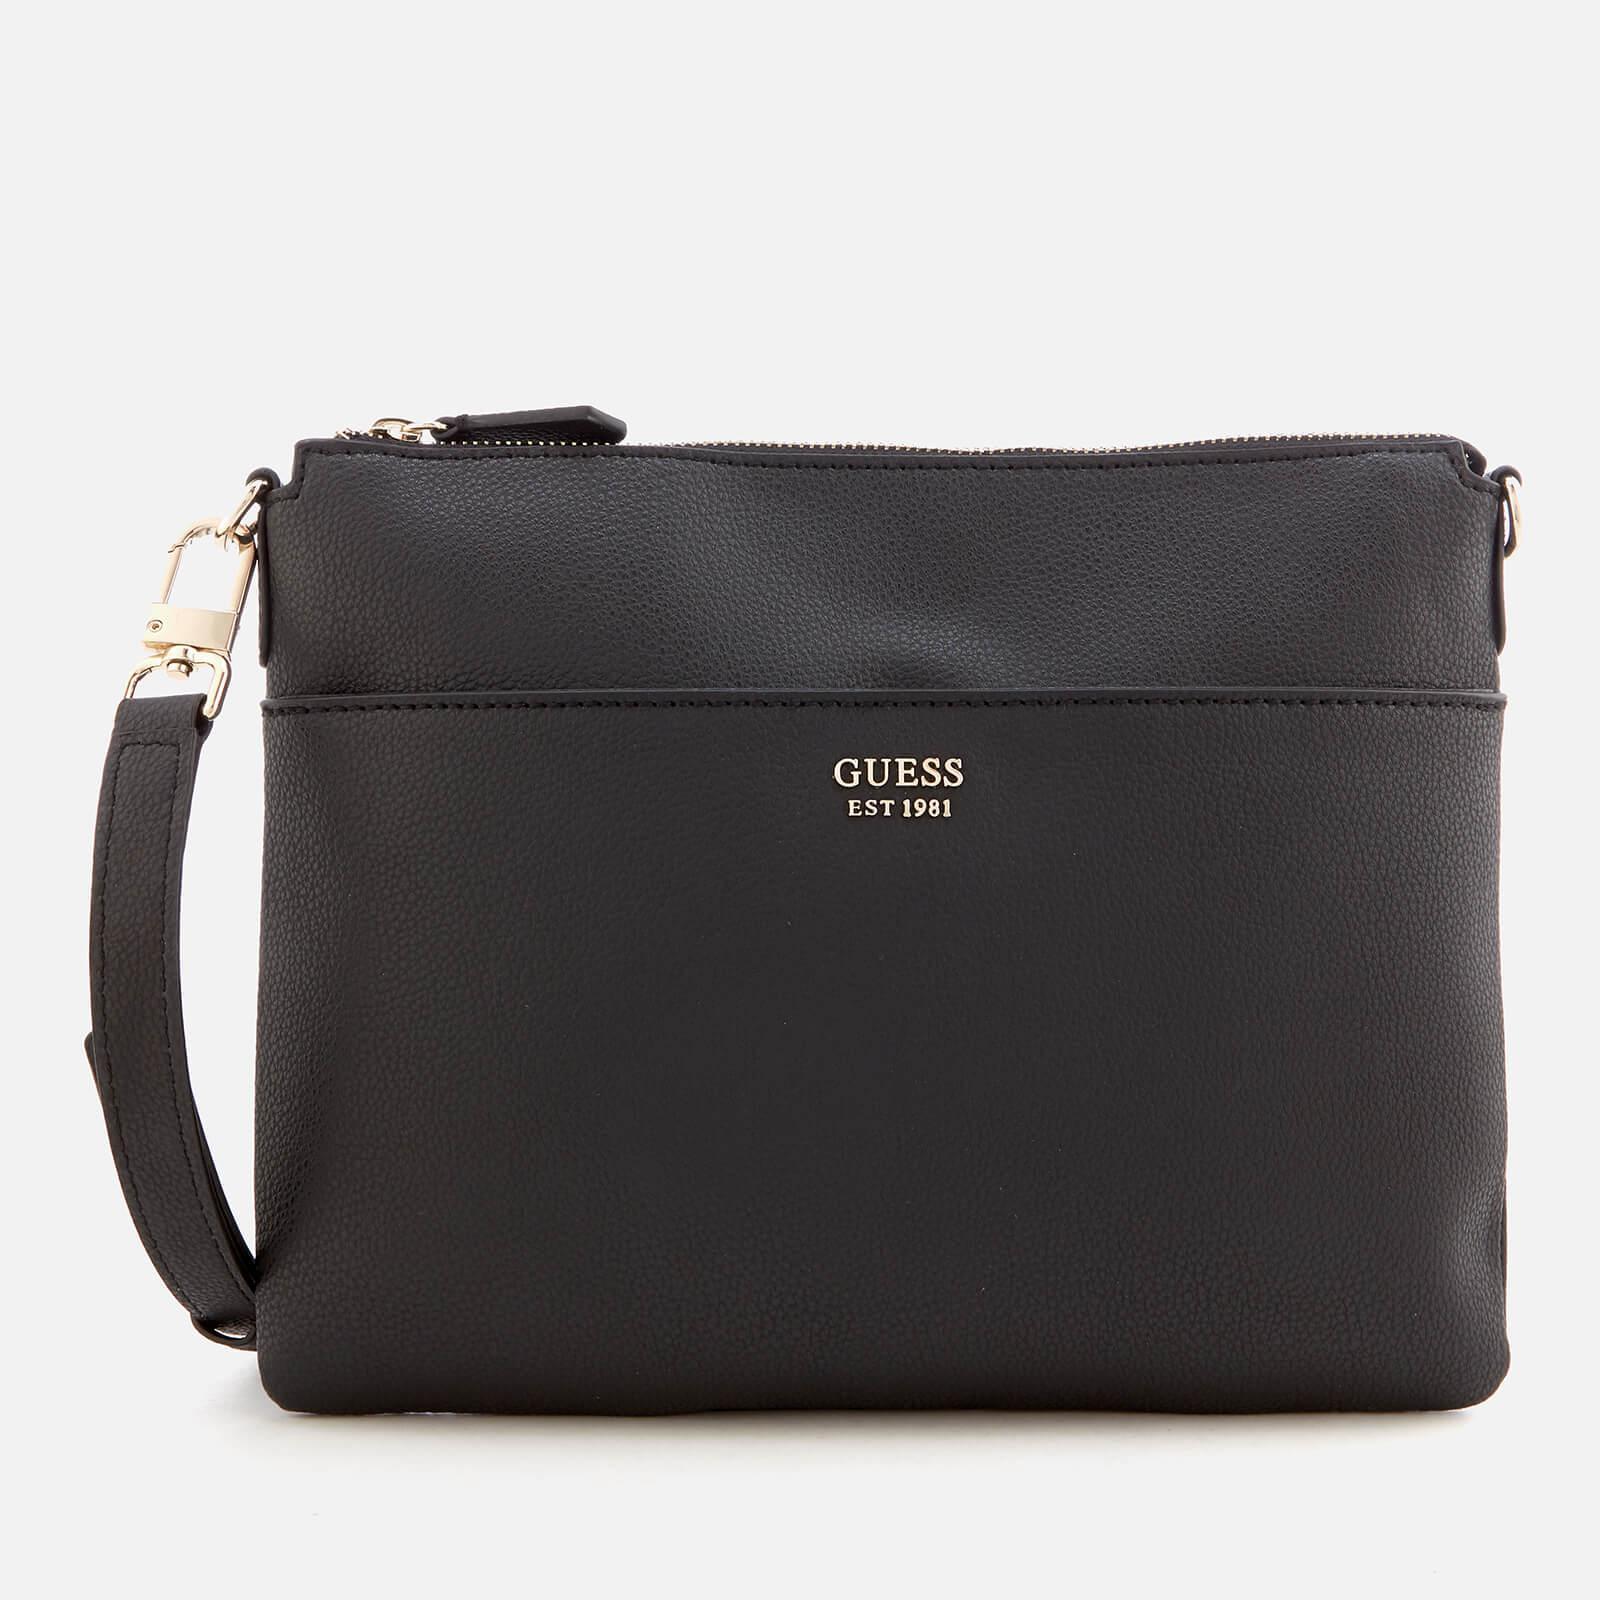 2756bfebb0be Lyst - Guess Digital Cross Body Bag in Black